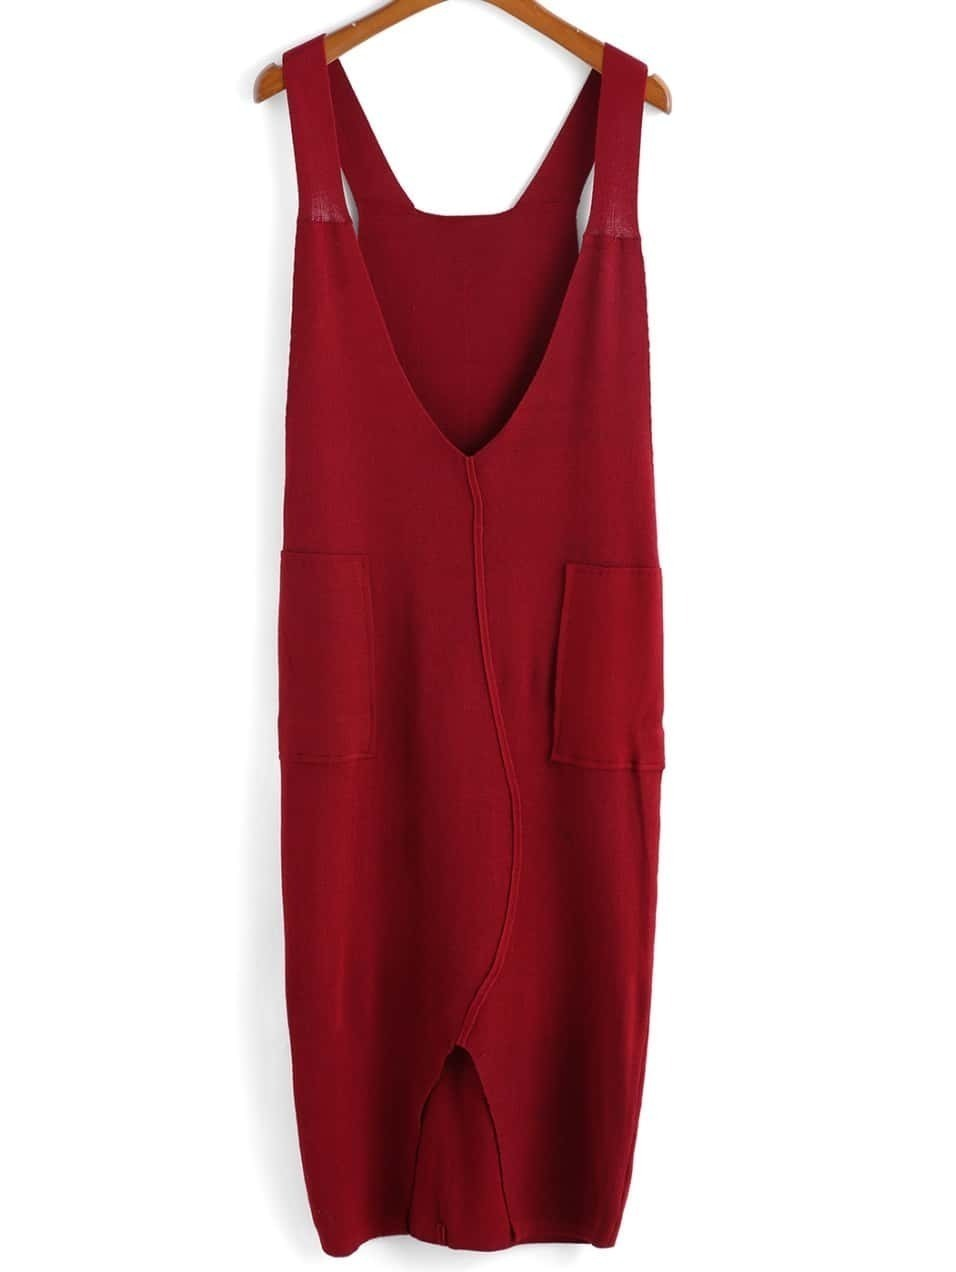 Robe col v fonc avec poches fendue rouge french romwe for Interieur paupiere inferieure rouge